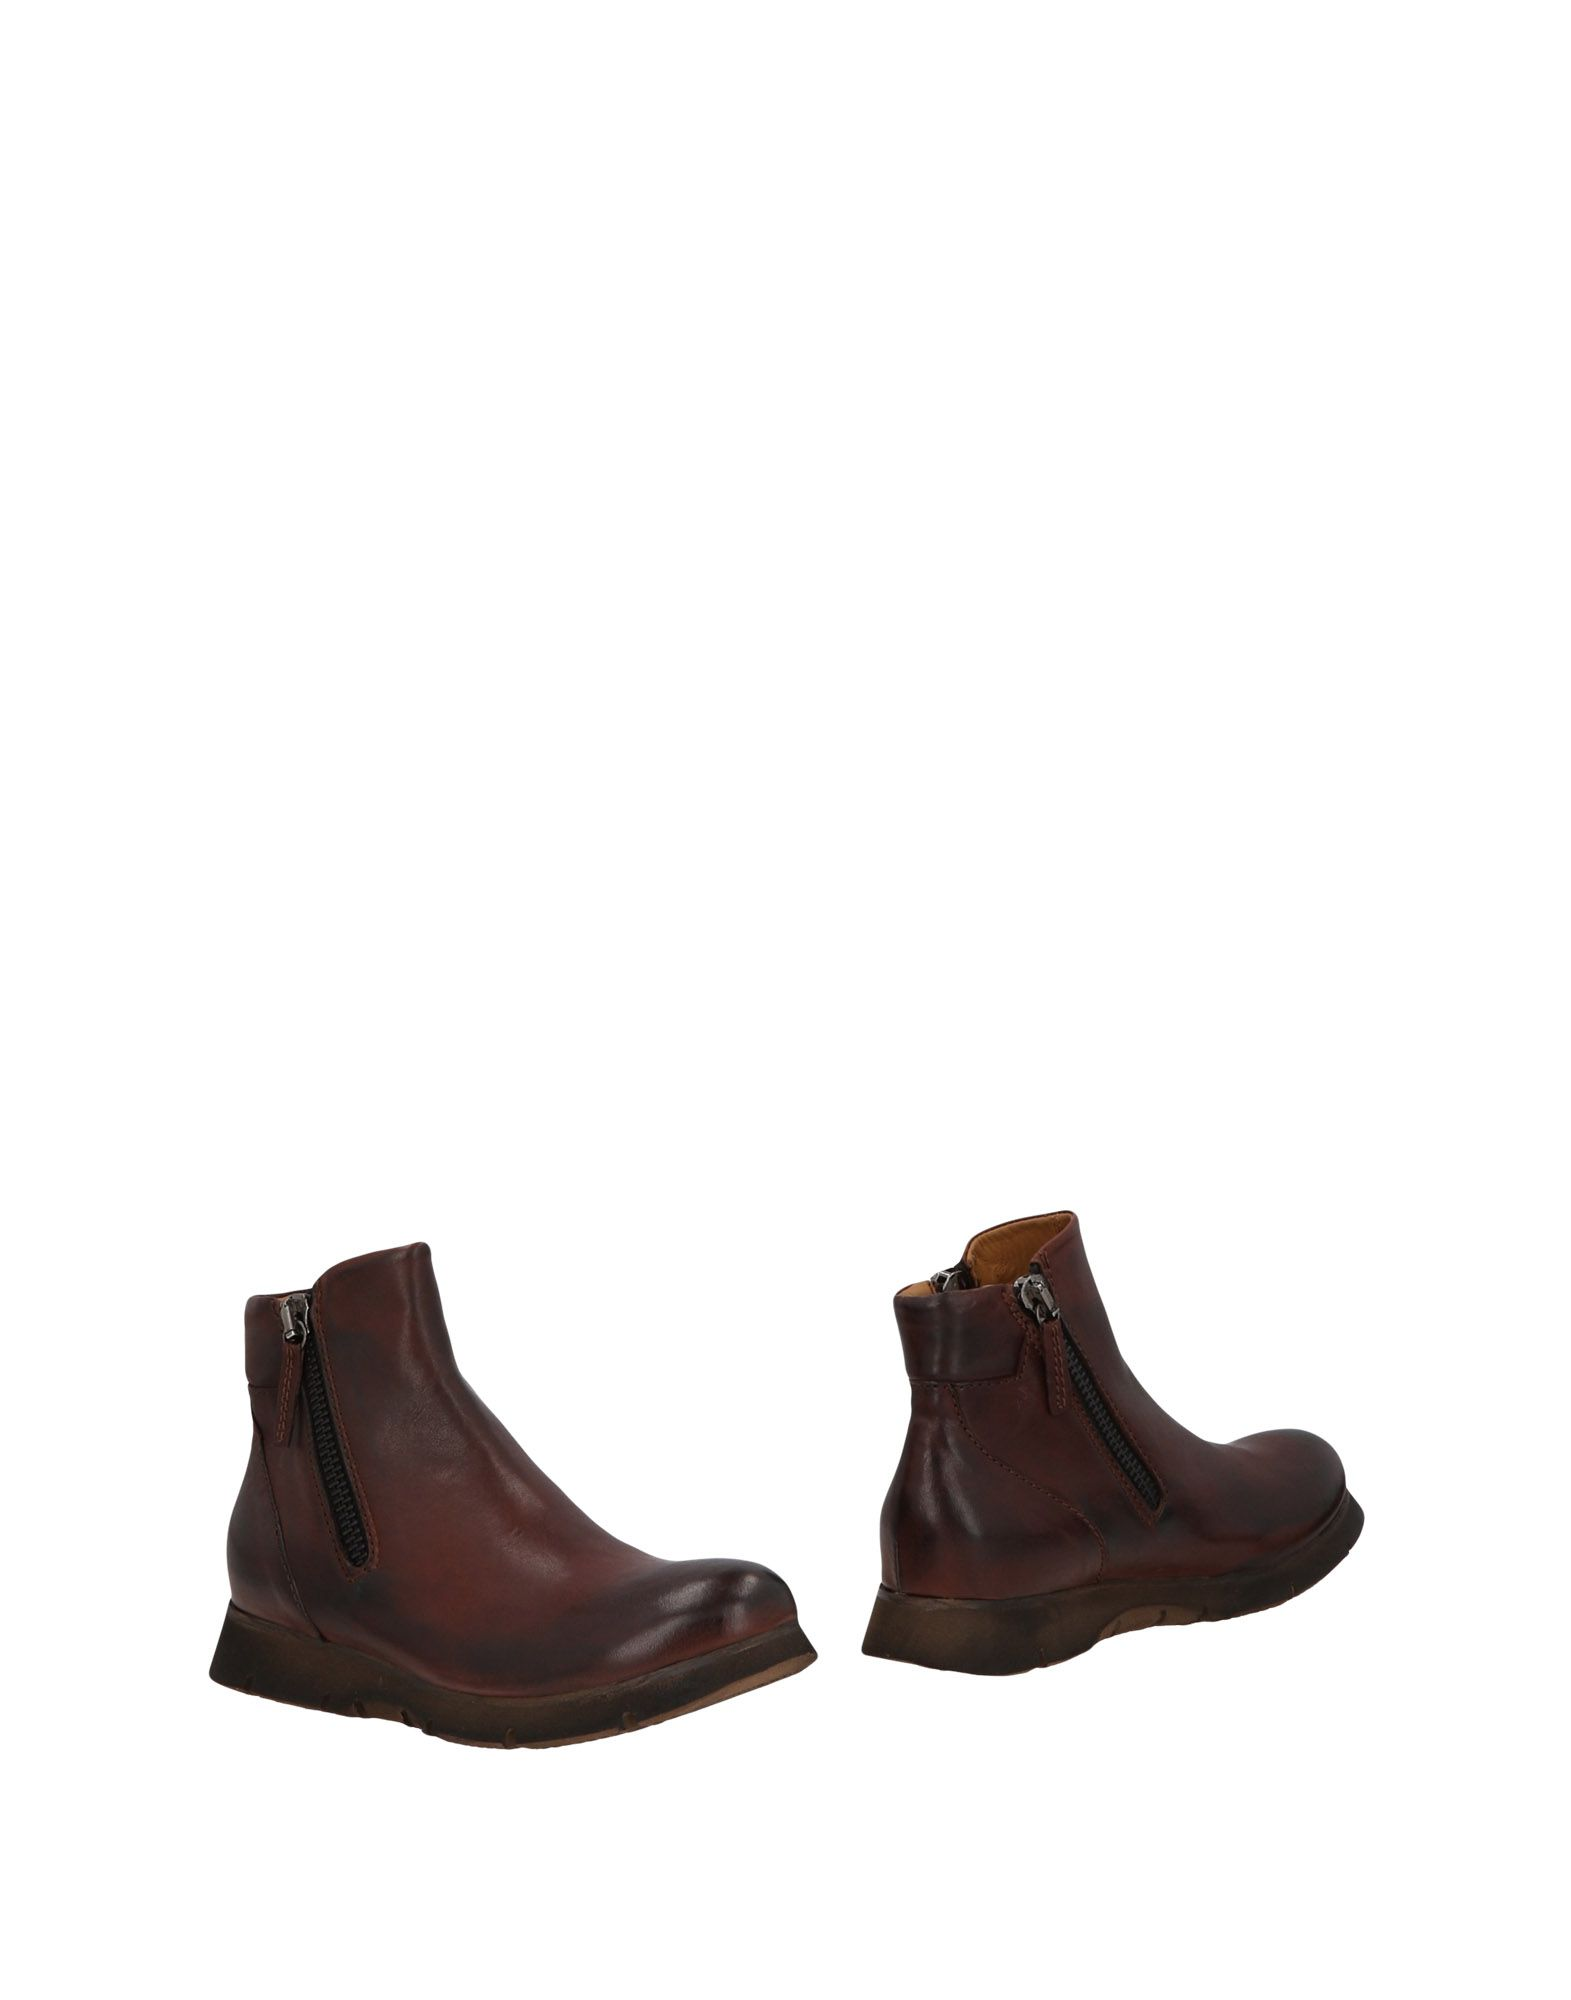 LA CORTE DELLA PELLE by FRANCO BALLIN Полусапоги и высокие ботинки franco bellucci полусапоги